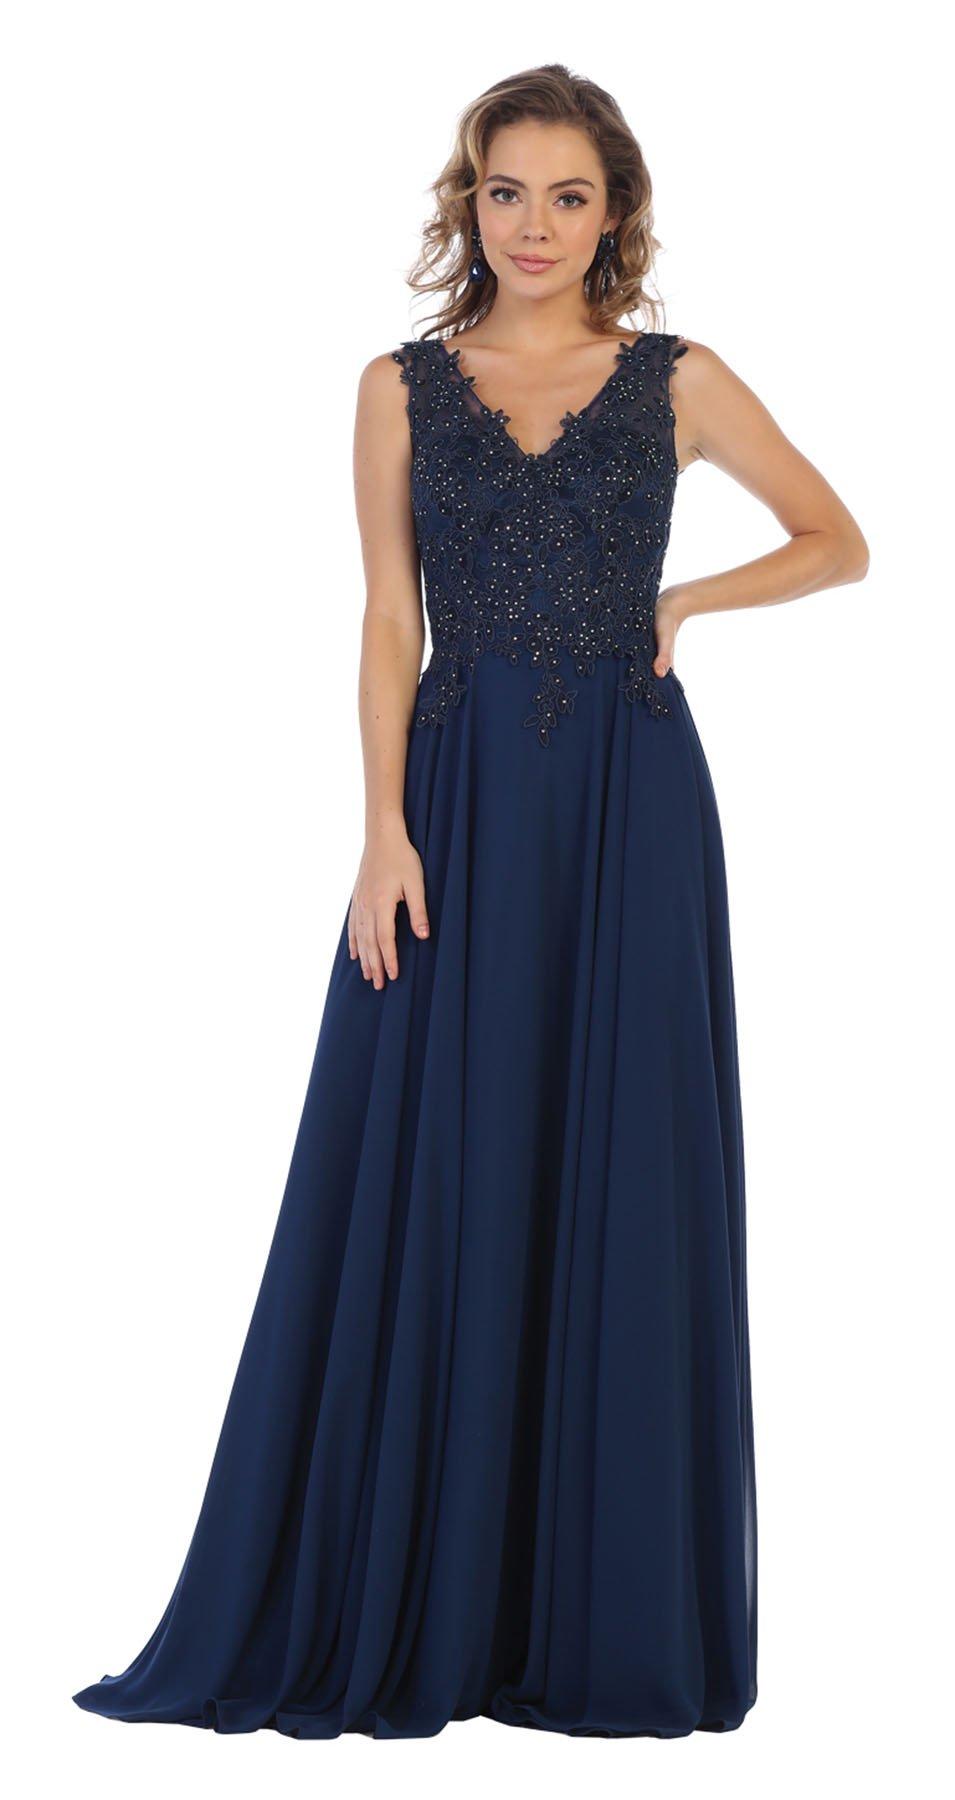 Flowy Evening Dresses